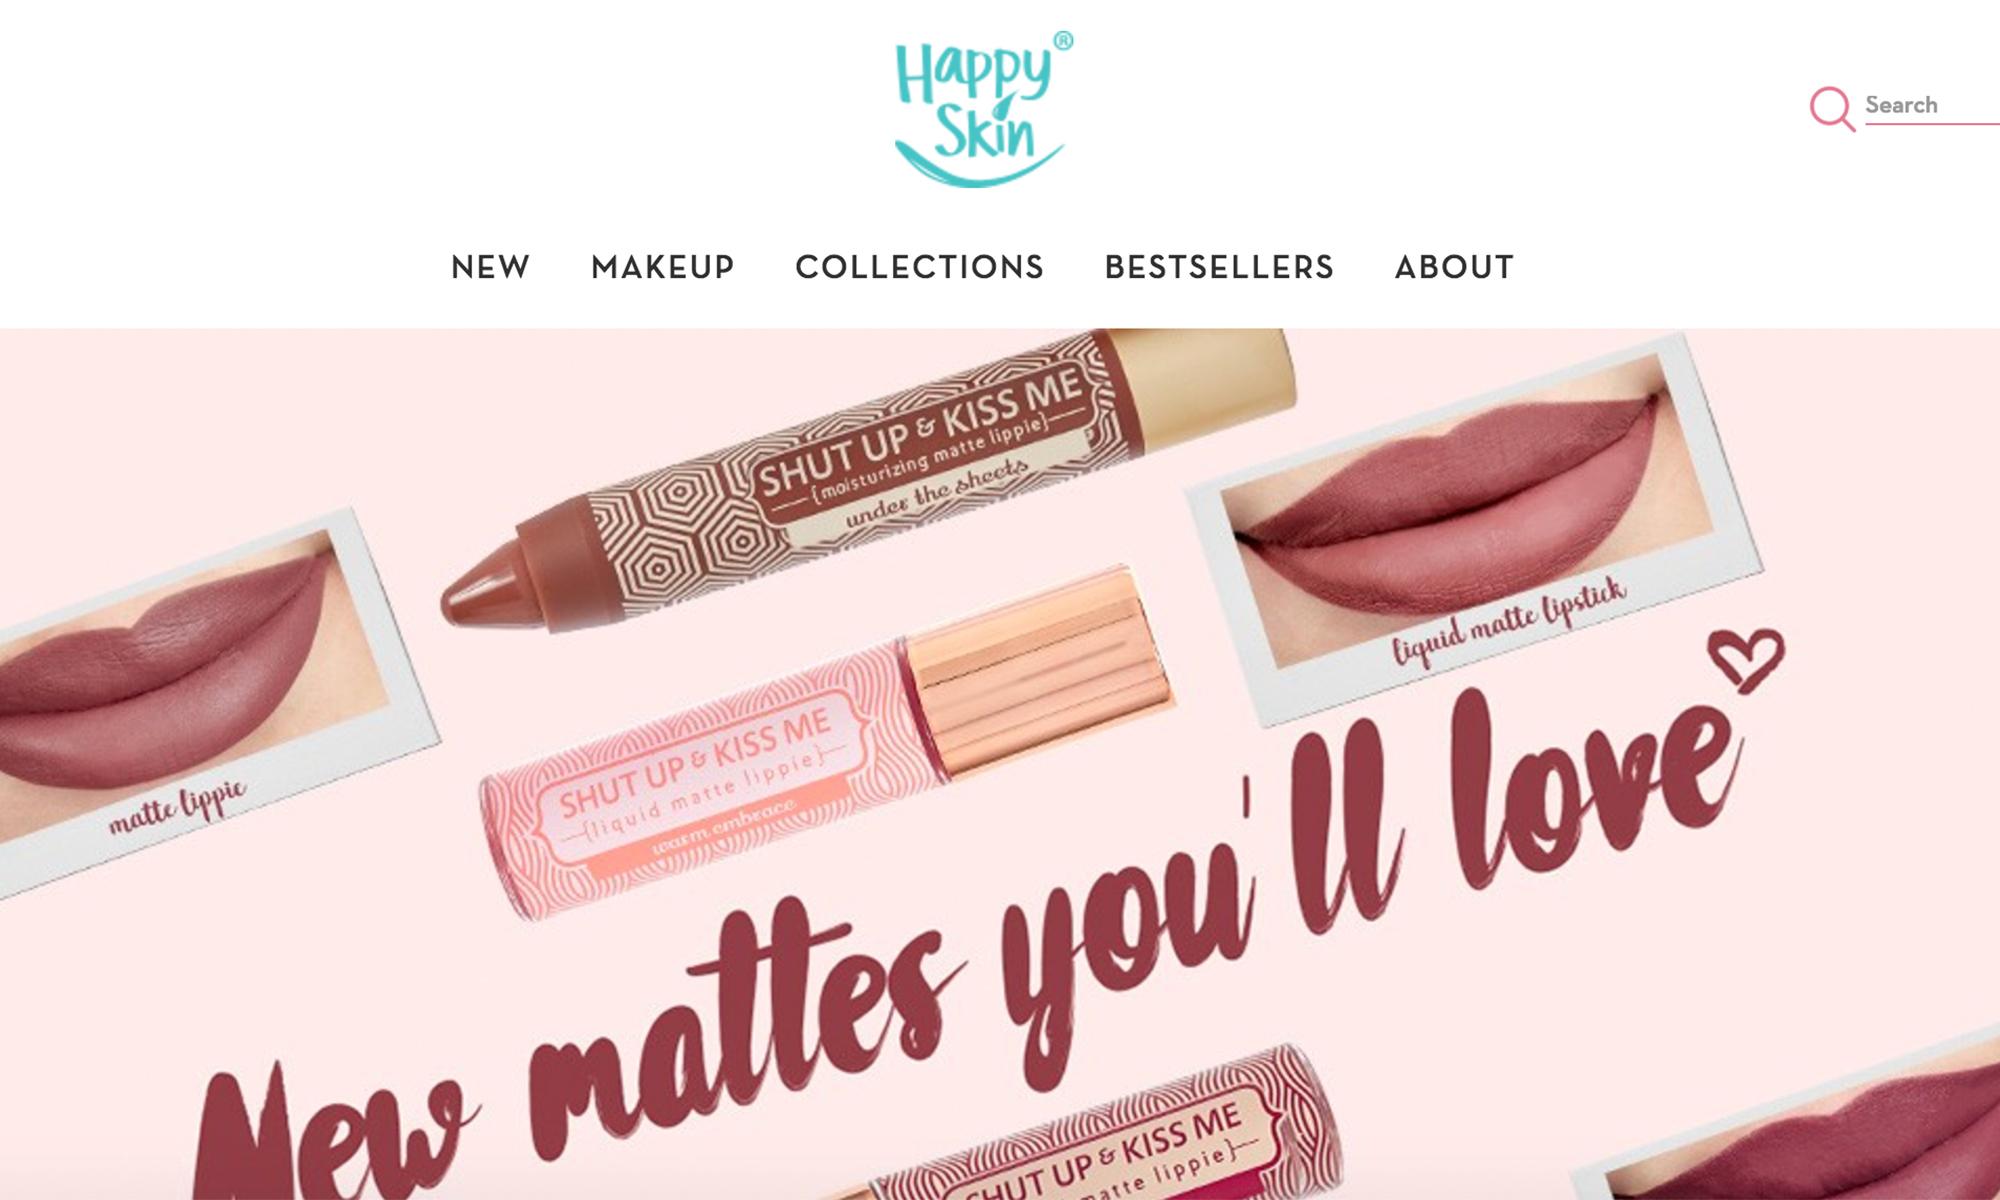 Screen capture of happyskincosmetics.com